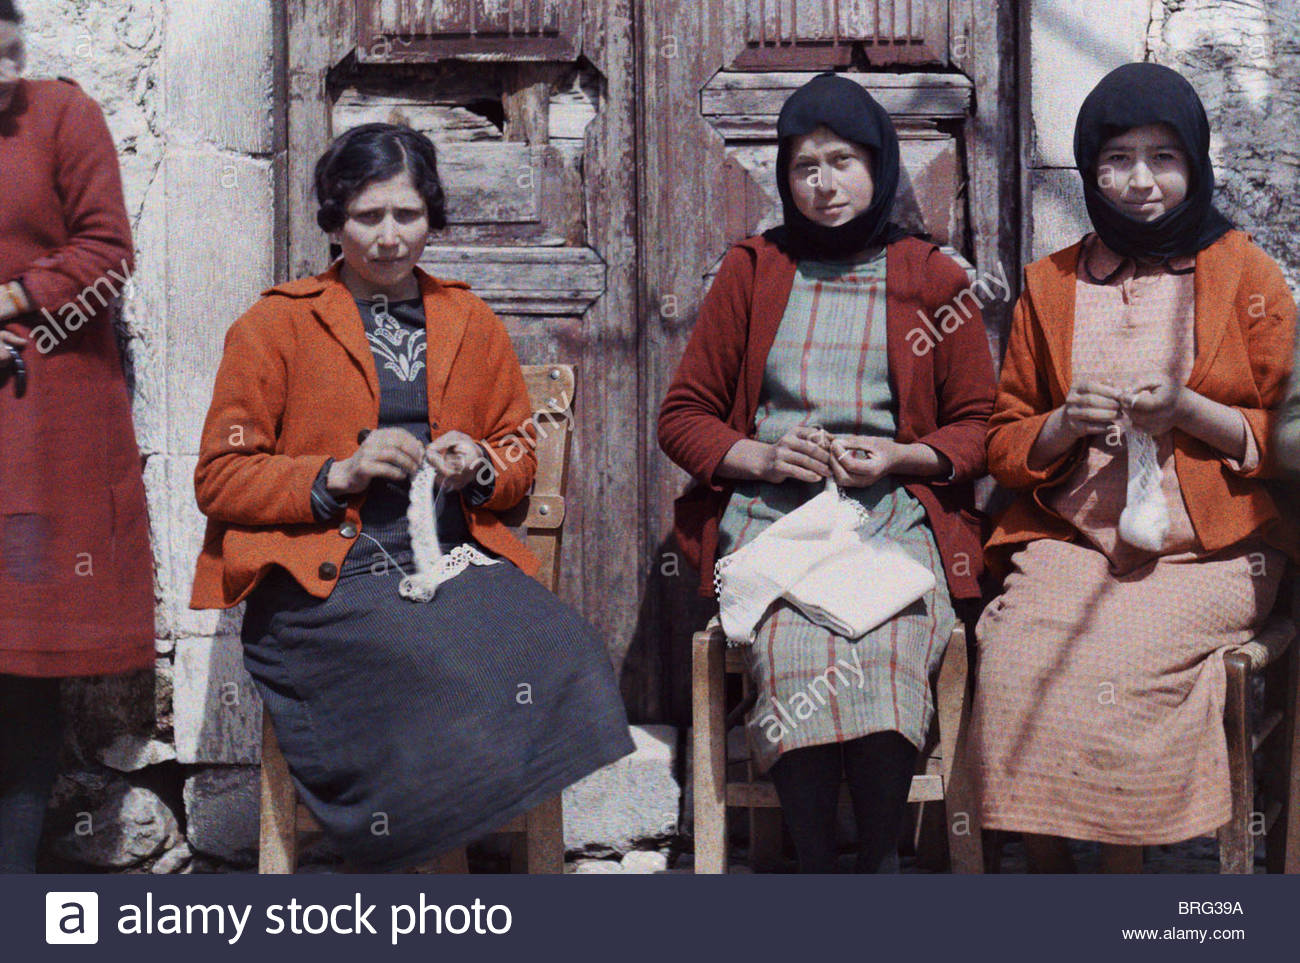 Three women sit and do needlework. - Stock Image